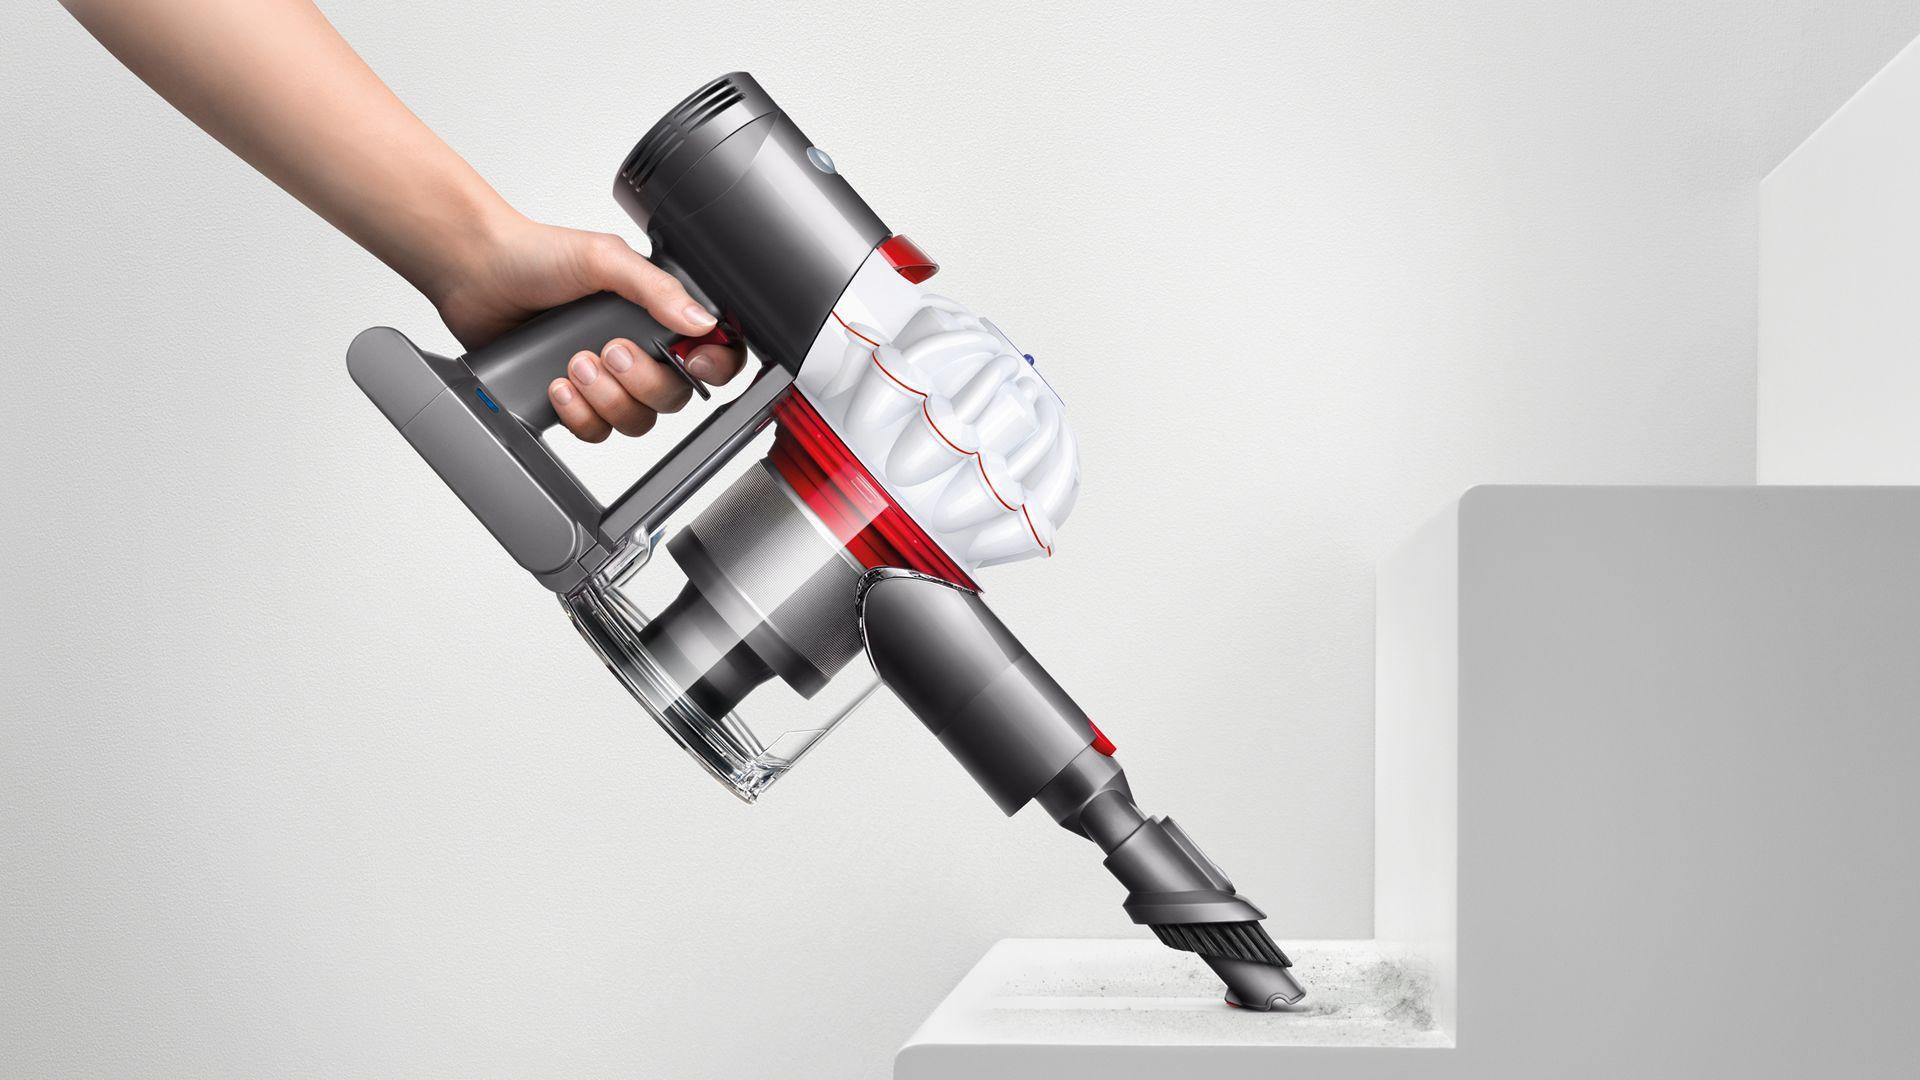 Buy the Dyson V7 Cord-free vacuum cleaner | Dyson Australia